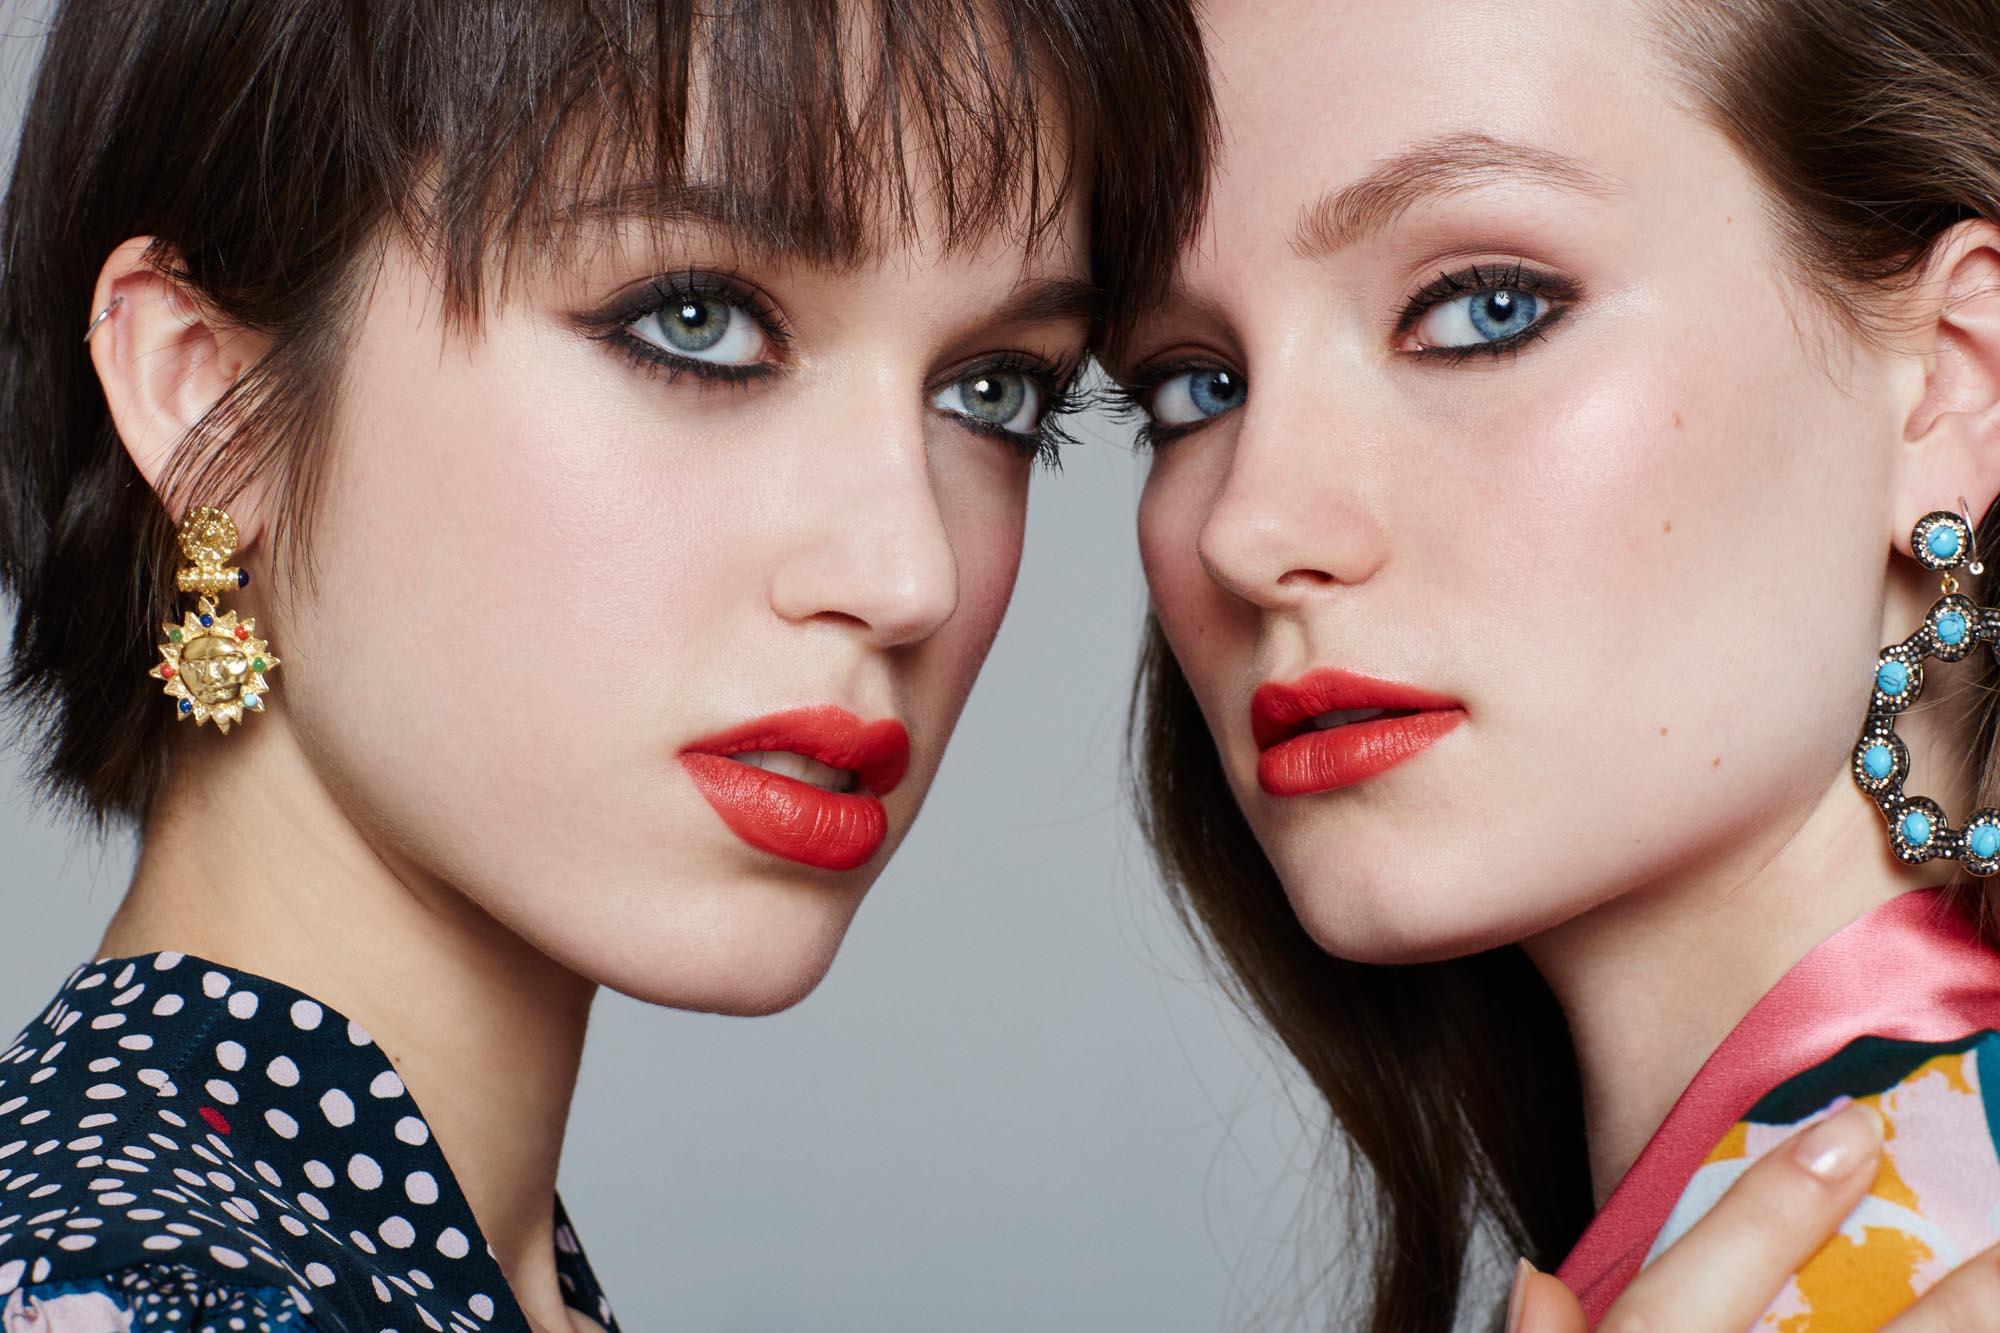 Models with beautiful makeup